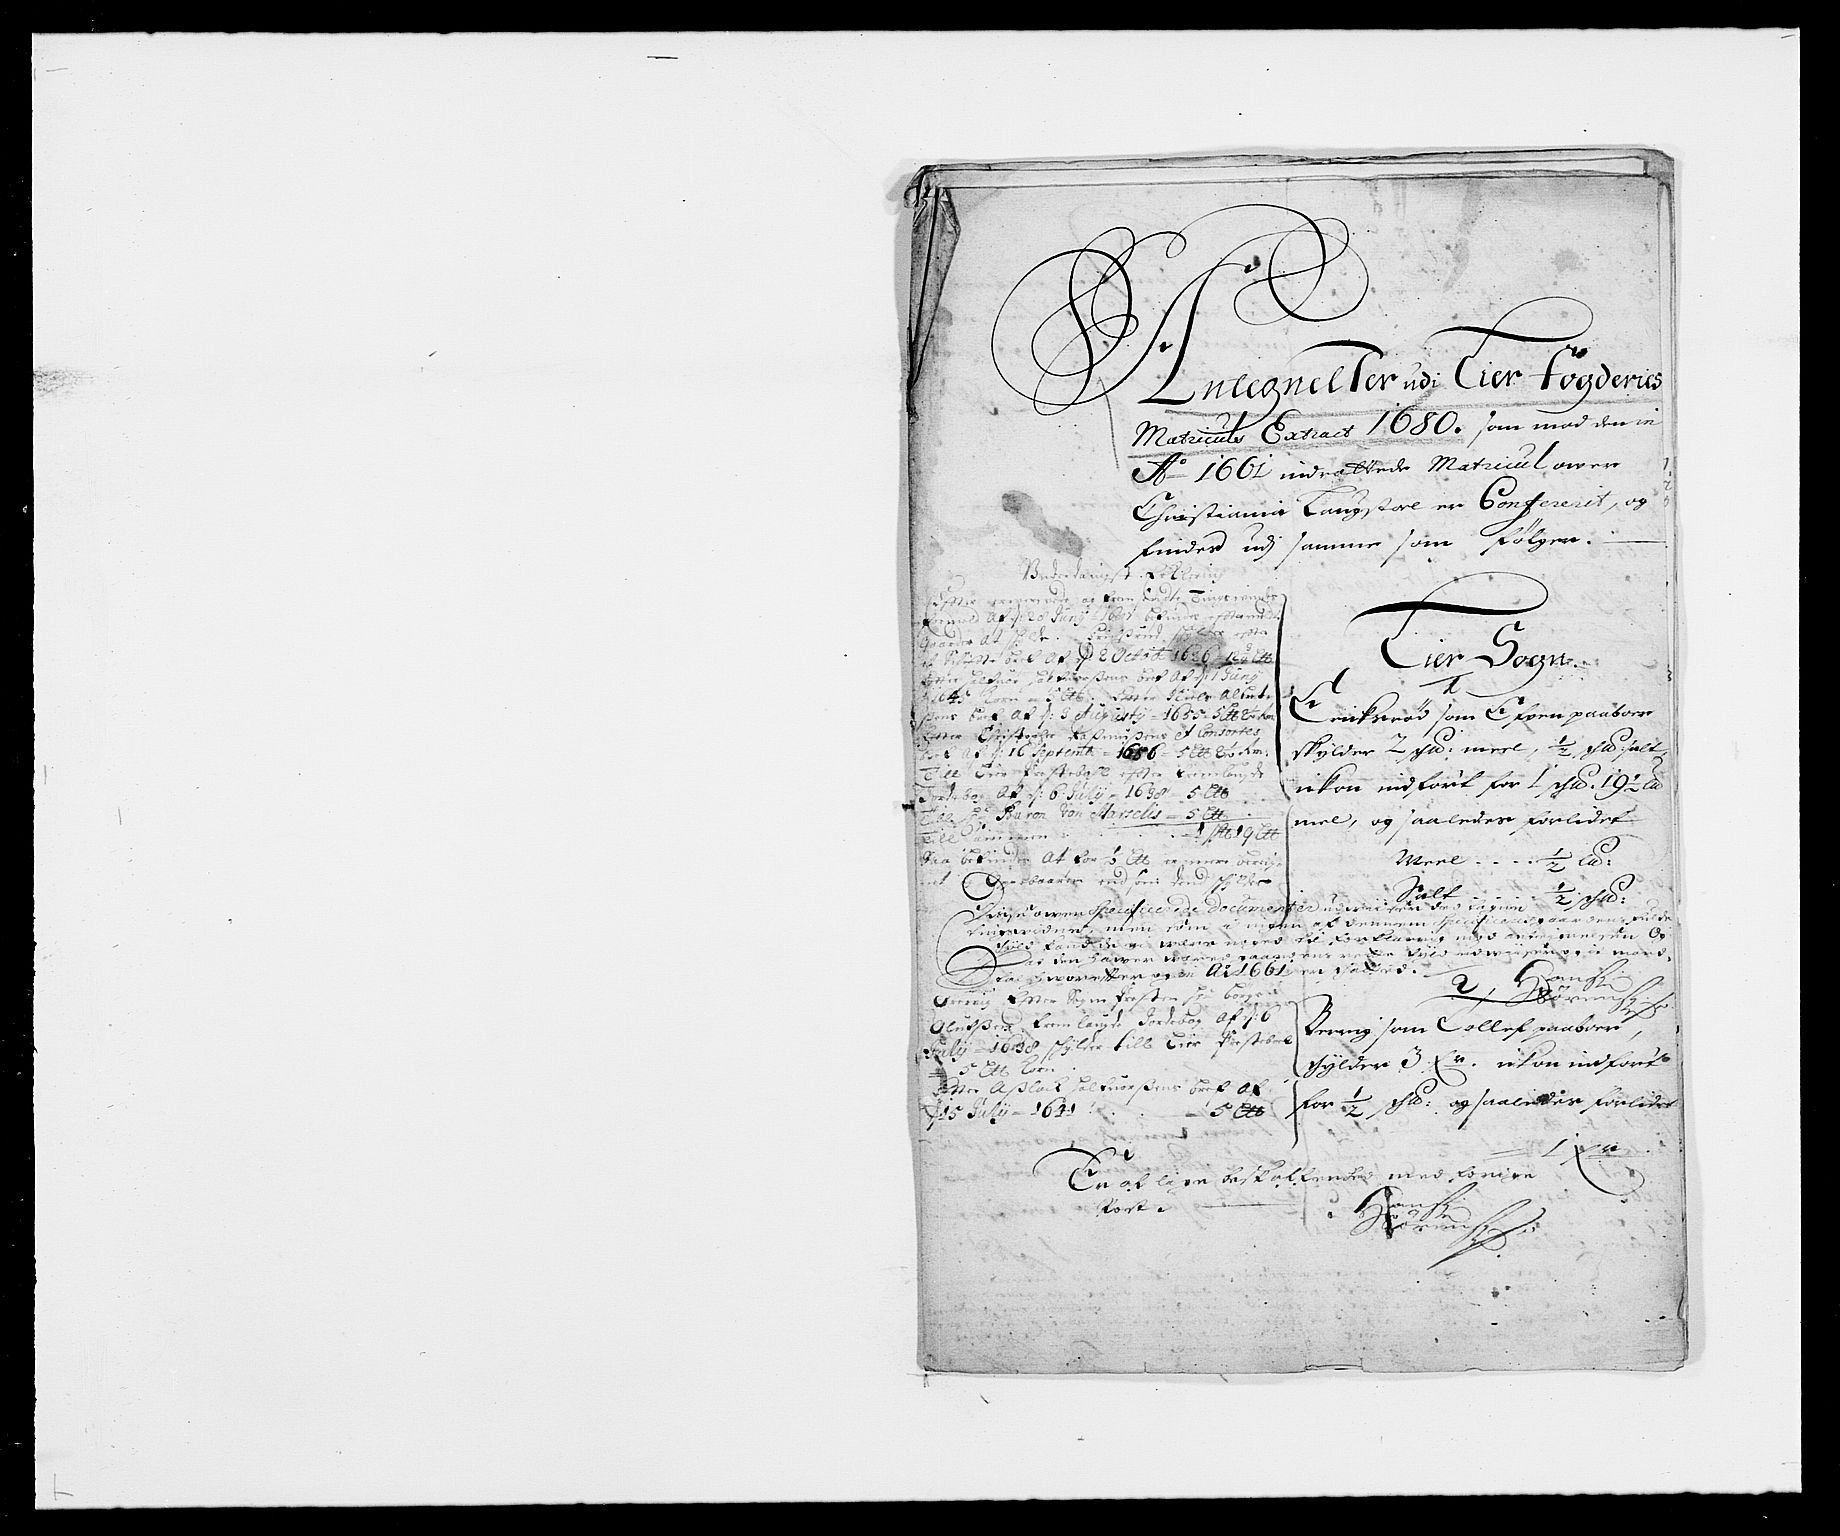 RA, Rentekammeret inntil 1814, Reviderte regnskaper, Fogderegnskap, R27/L1687: Fogderegnskap Lier, 1678-1686, s. 419